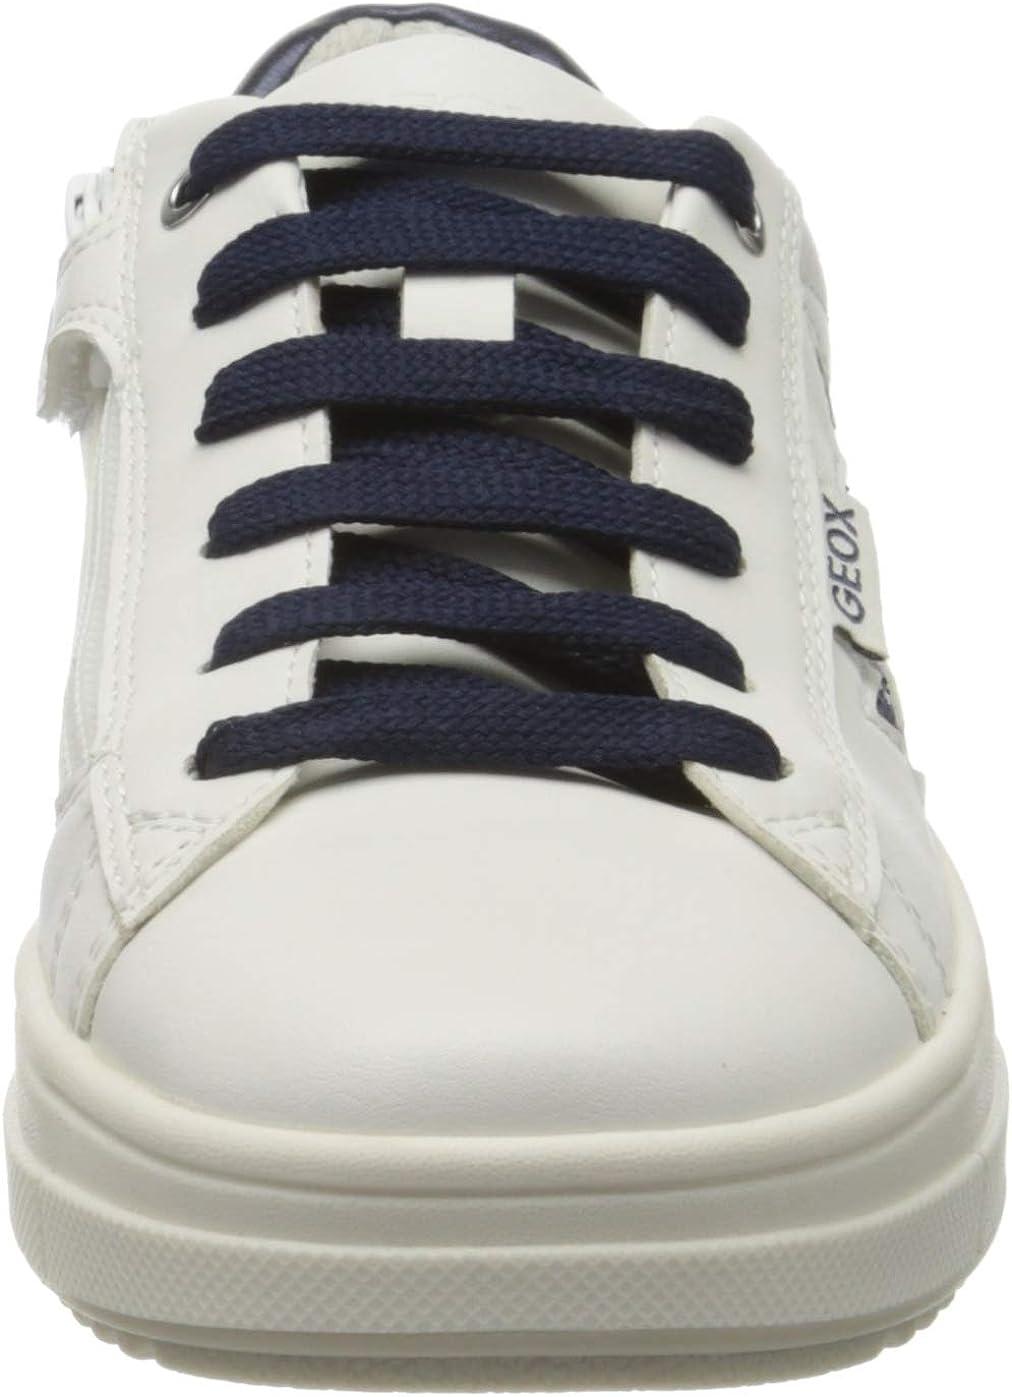 Geox J Rebecca Girl B Sneakers Basses Fille